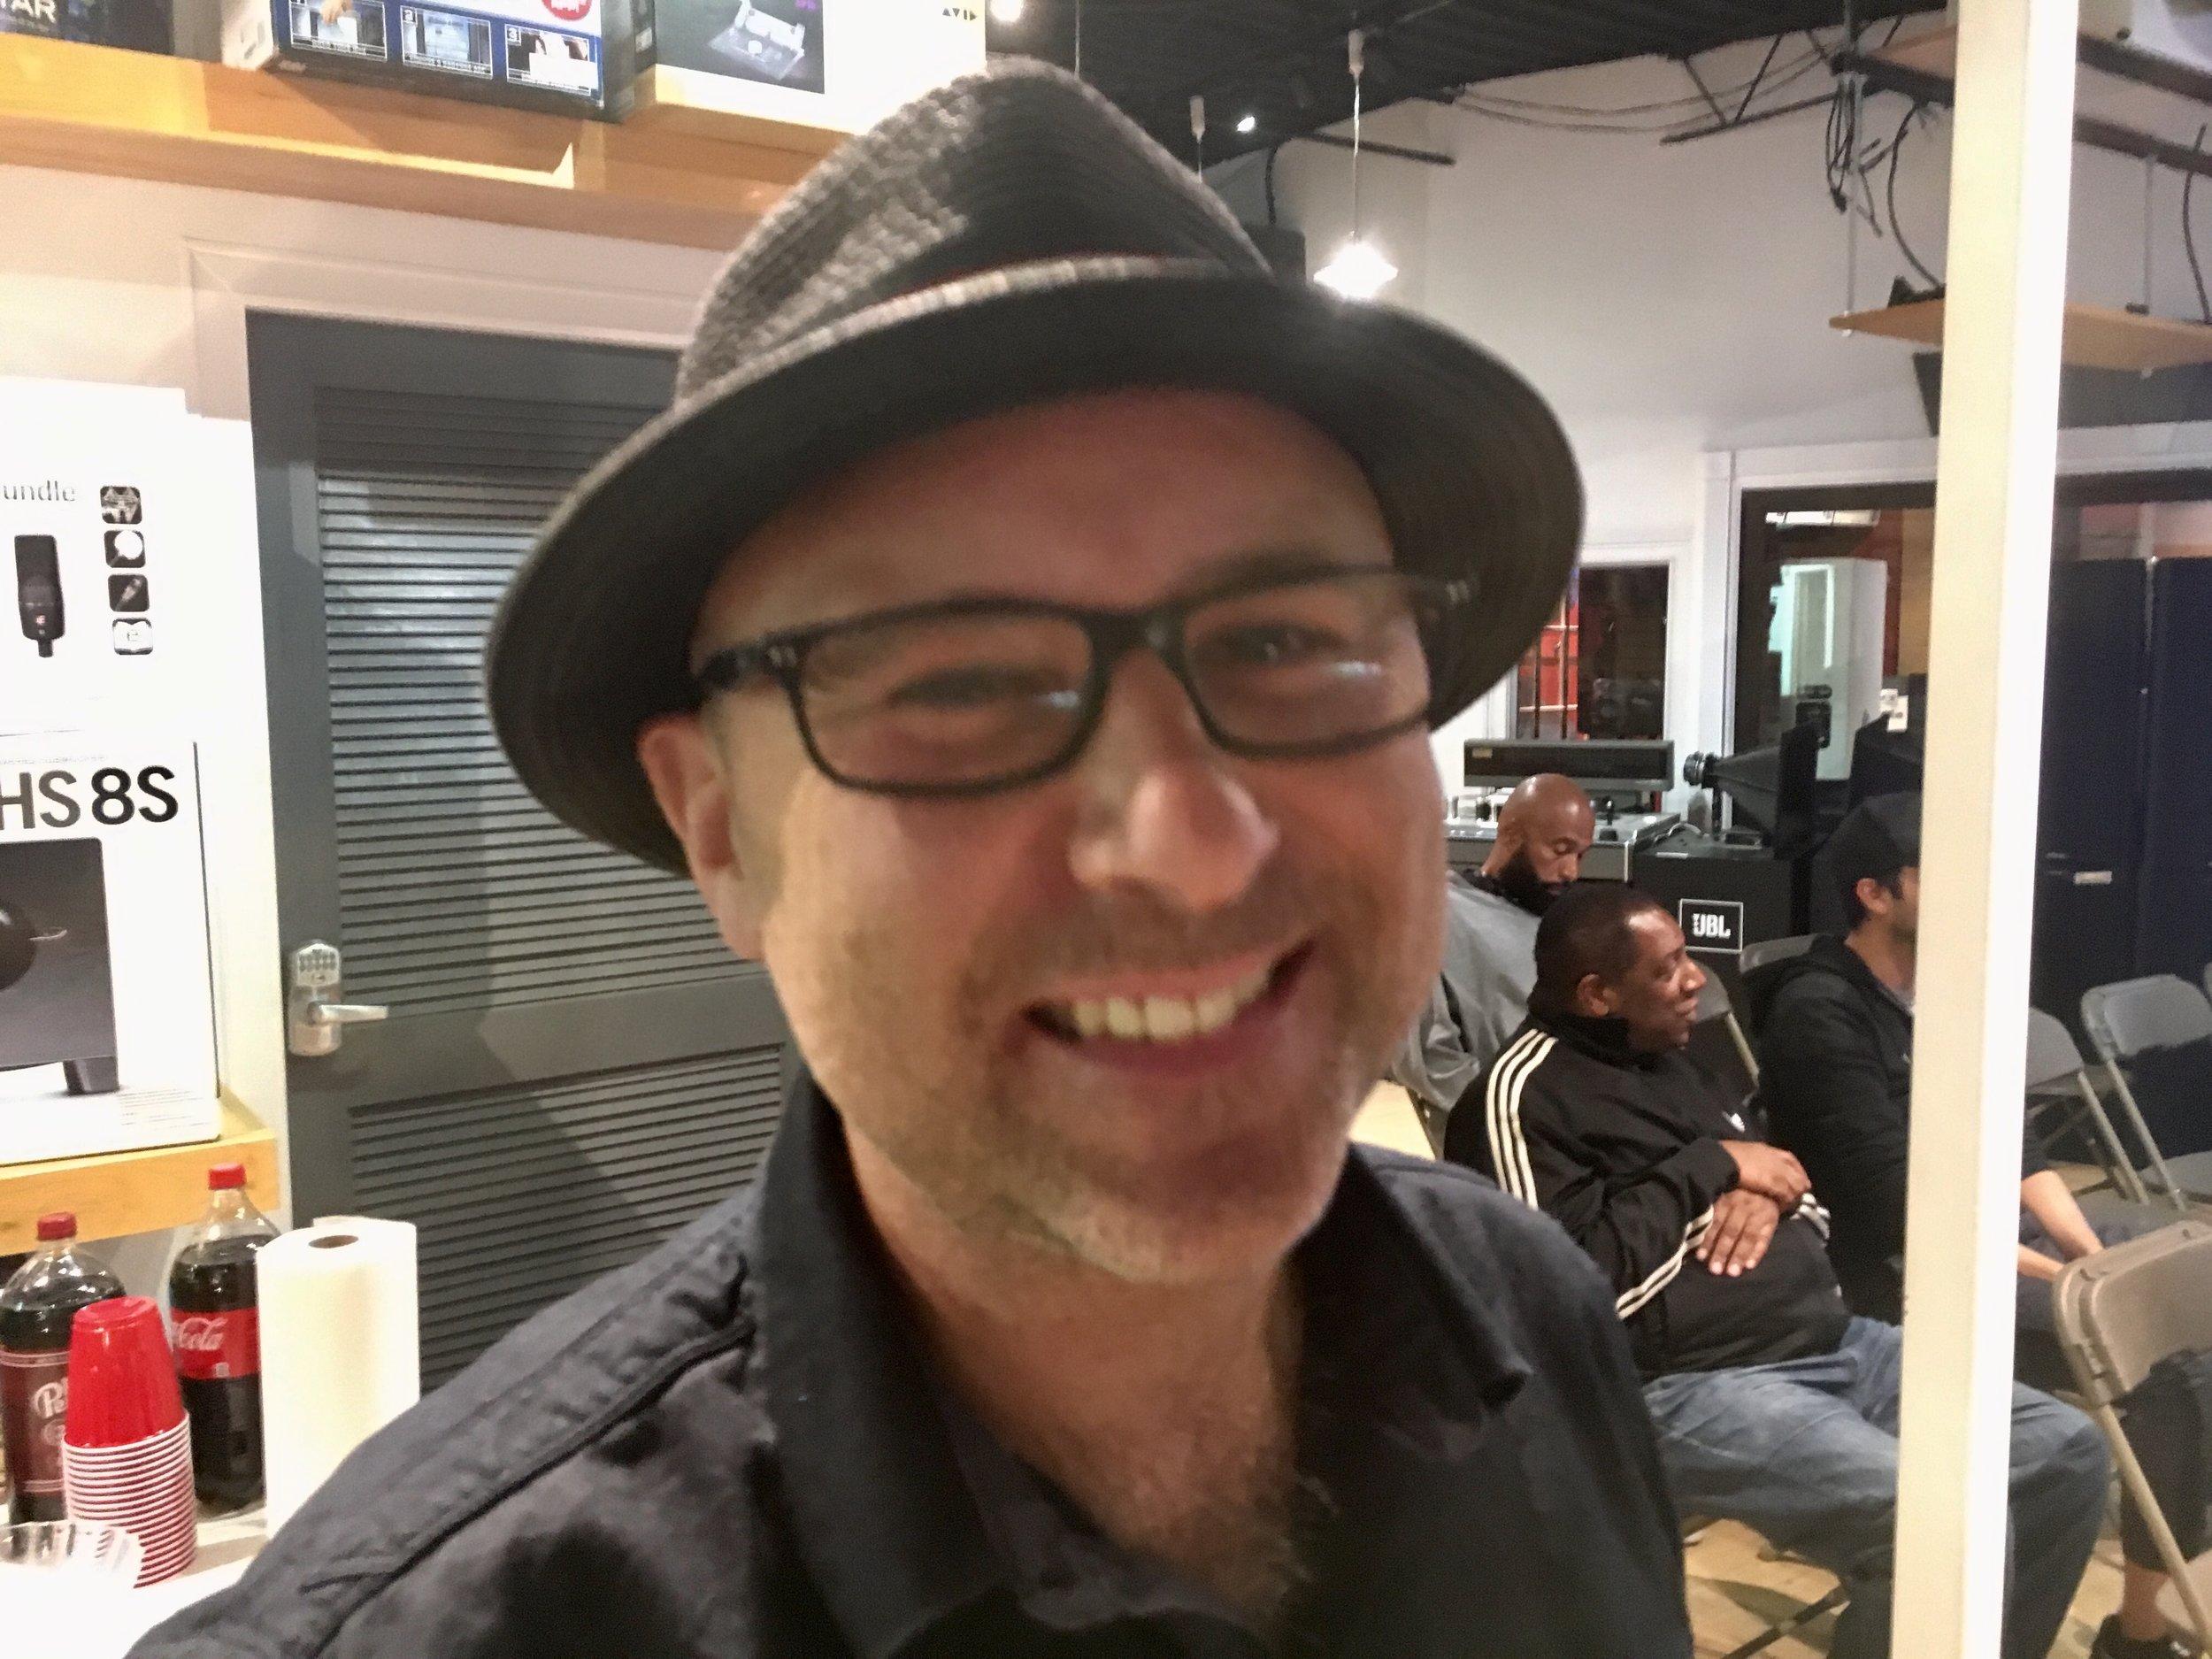 Jason Salzman demos UA products